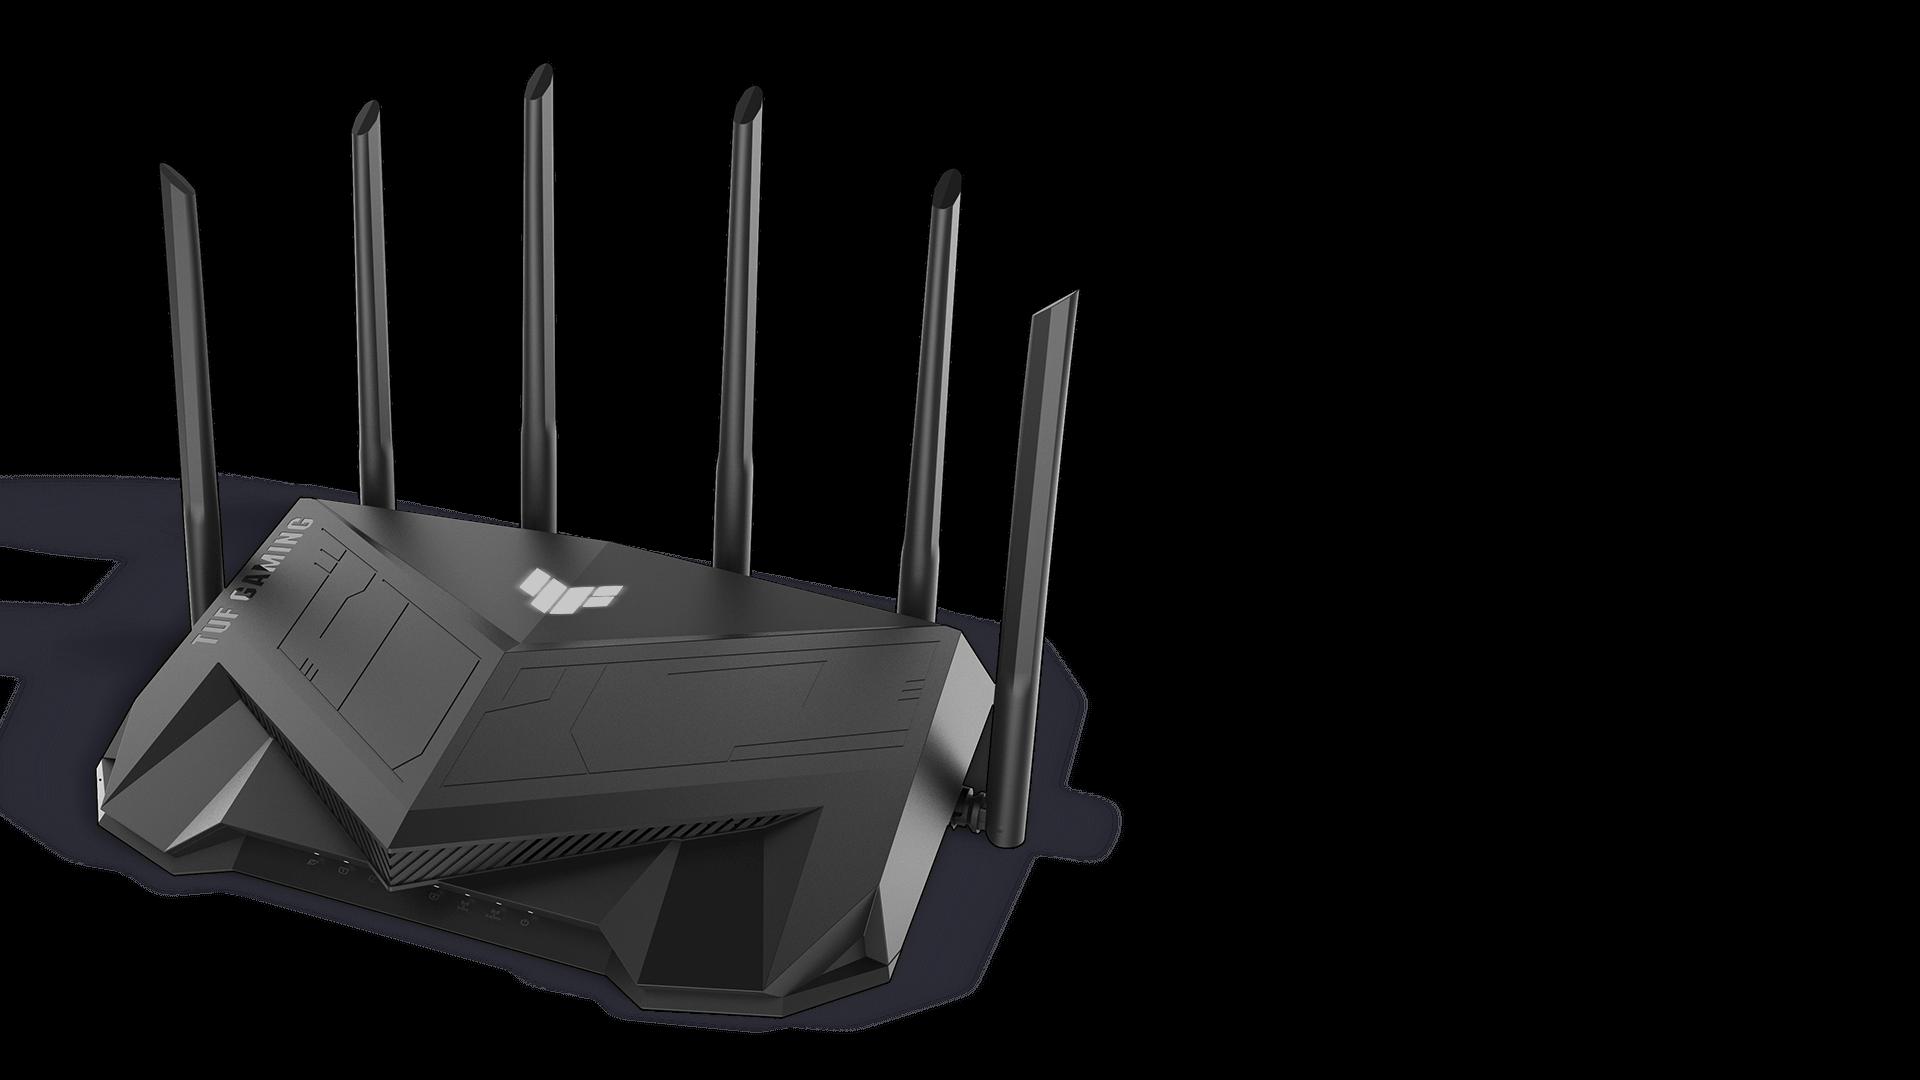 ASUS TUF Gaming AX5400 router met RGB-verlichting